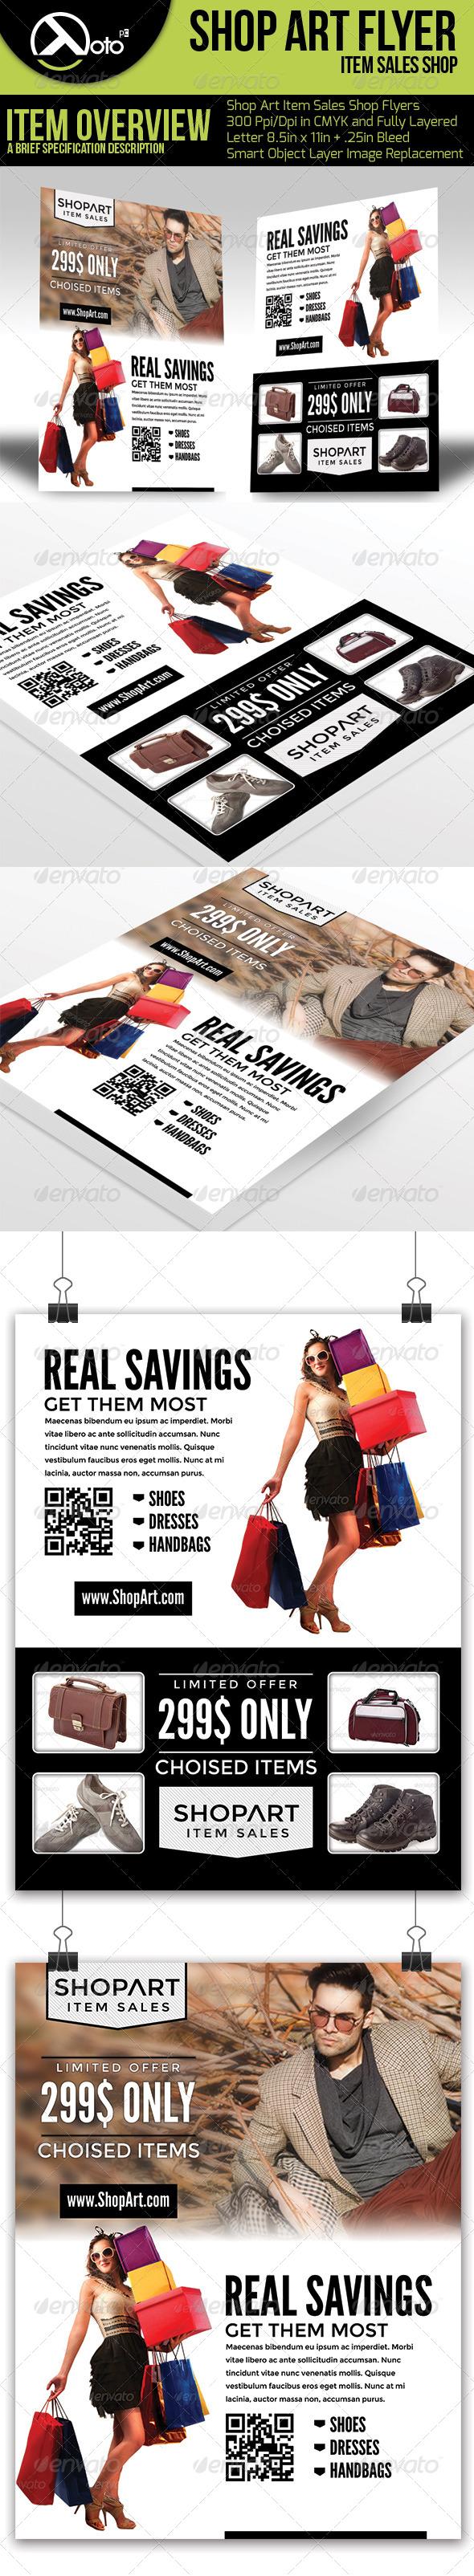 ShopArt Online Shopping Flyers - Commerce Flyers